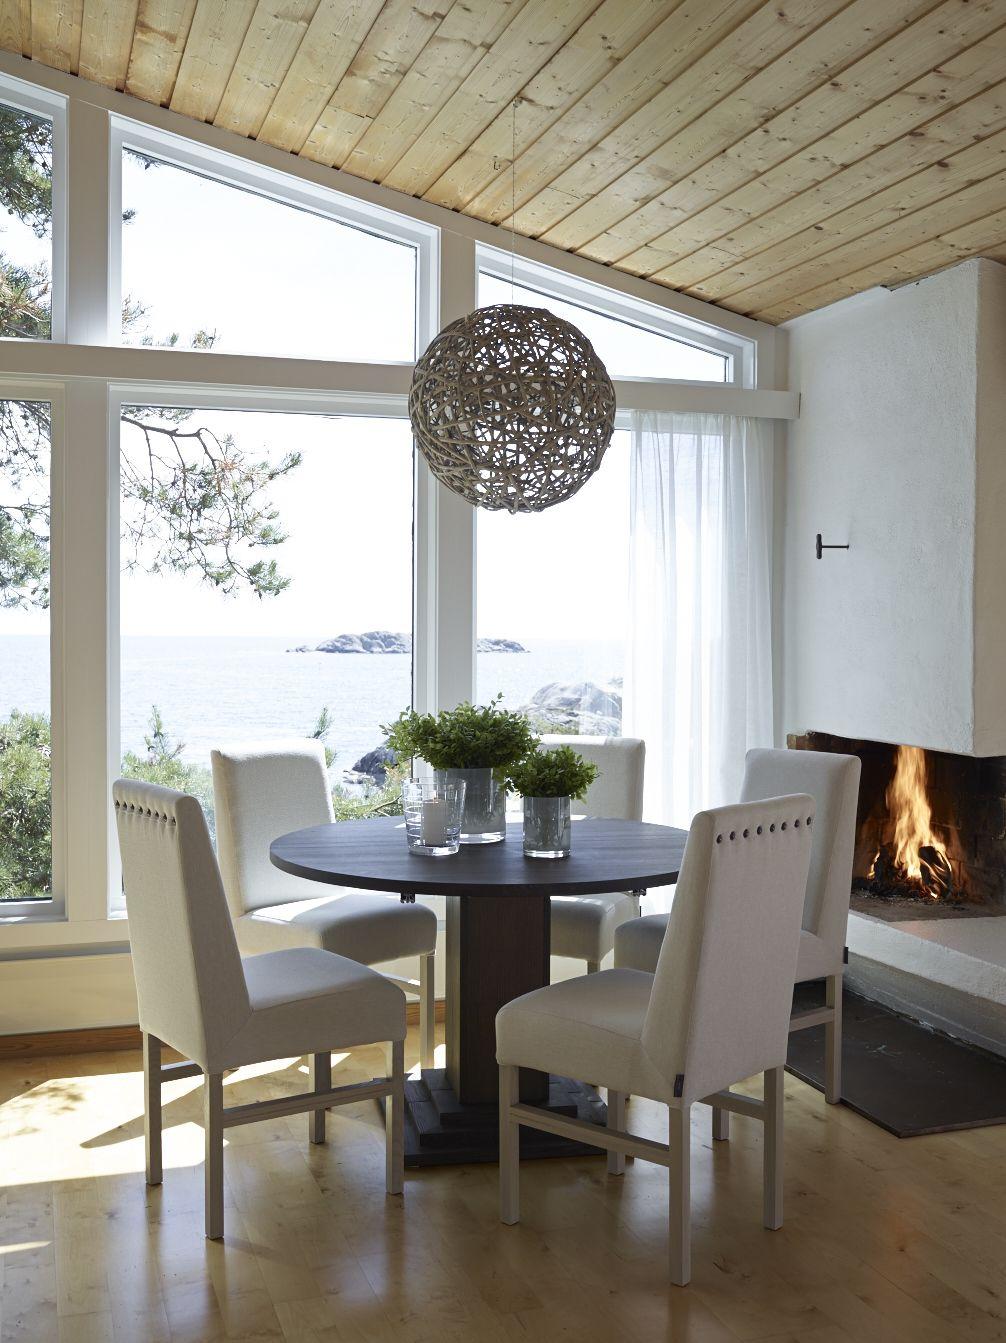 Bohus-signature-collection (7) | Grimstad, rossevika | Pinterest ...